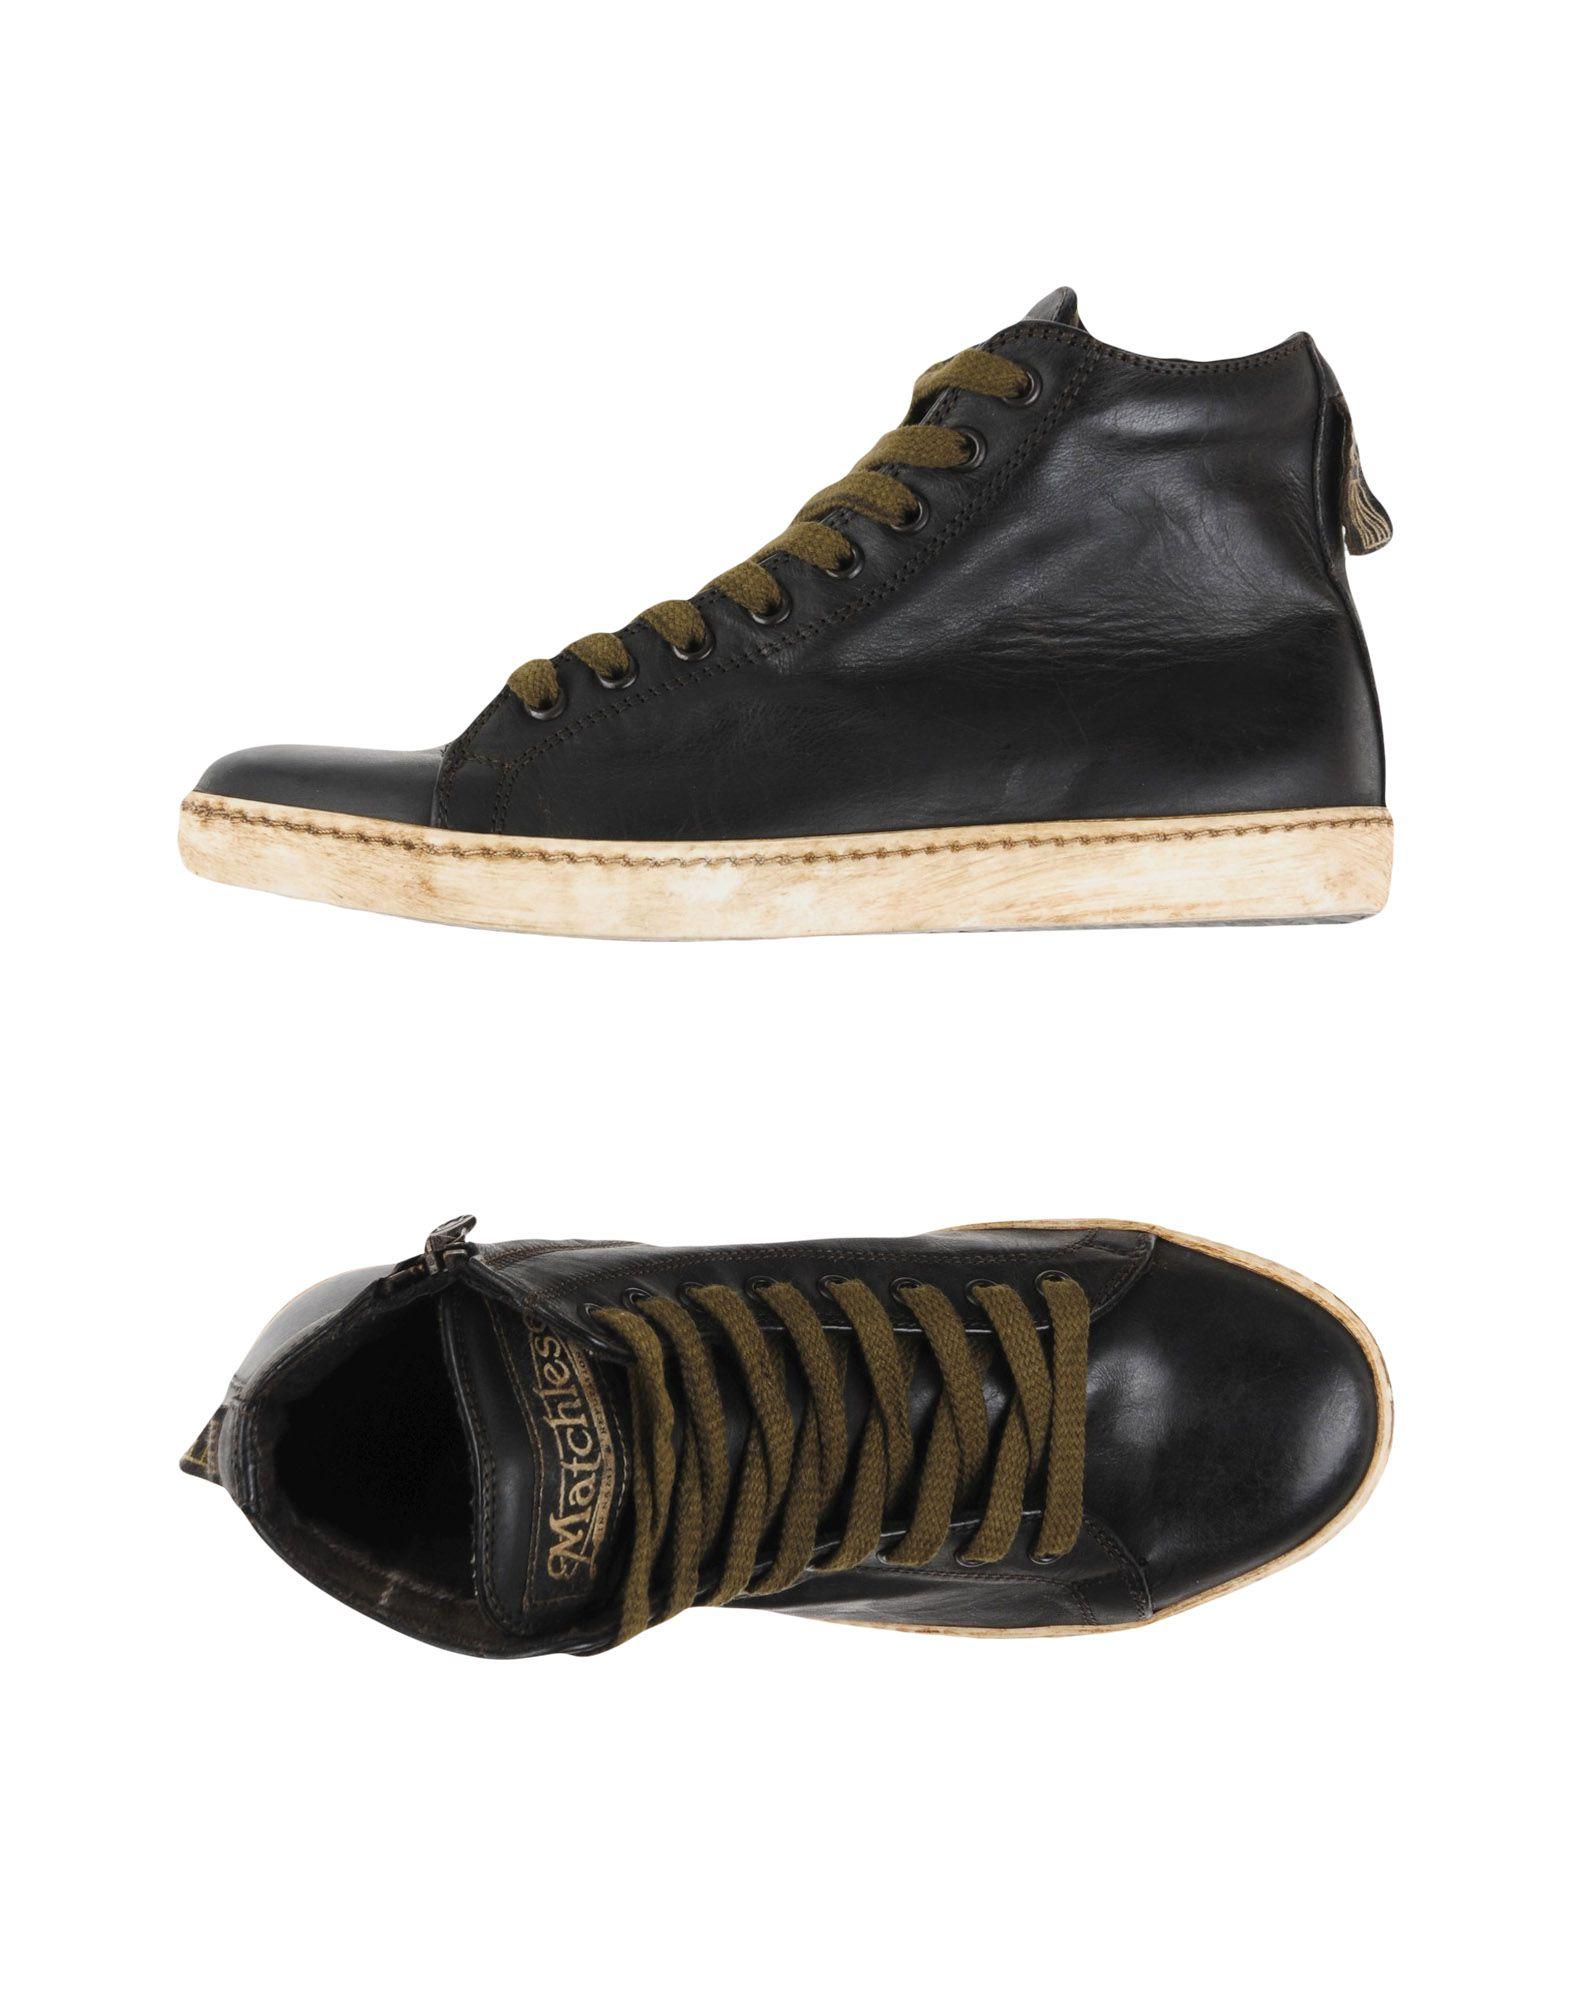 MATCHLESS Высокие кеды и кроссовки кеды кроссовки высокие dc council mid tx stone camo